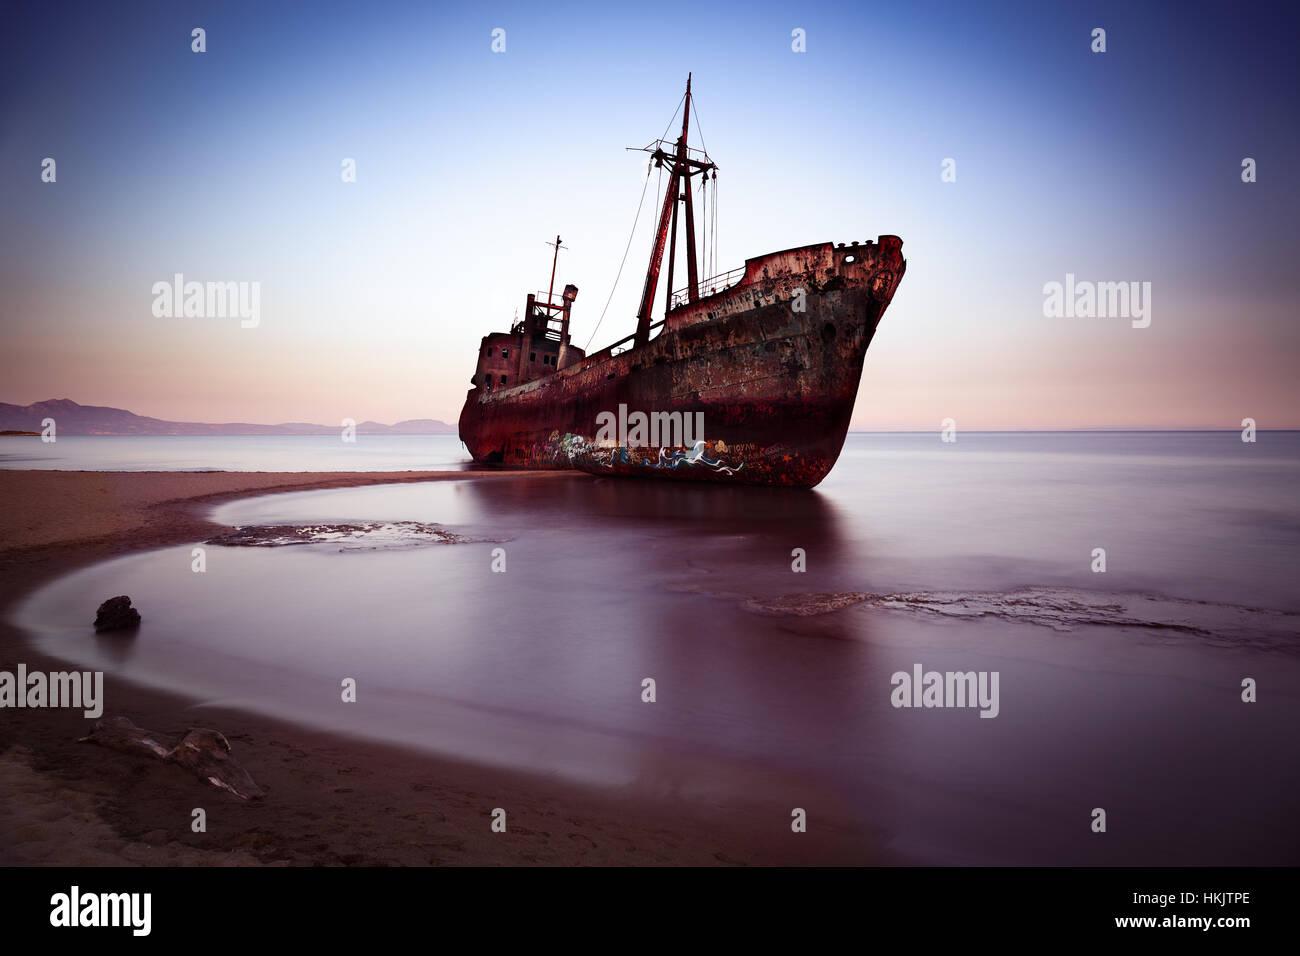 Wreck at Mediterranean Sea, Greece Stock Photo